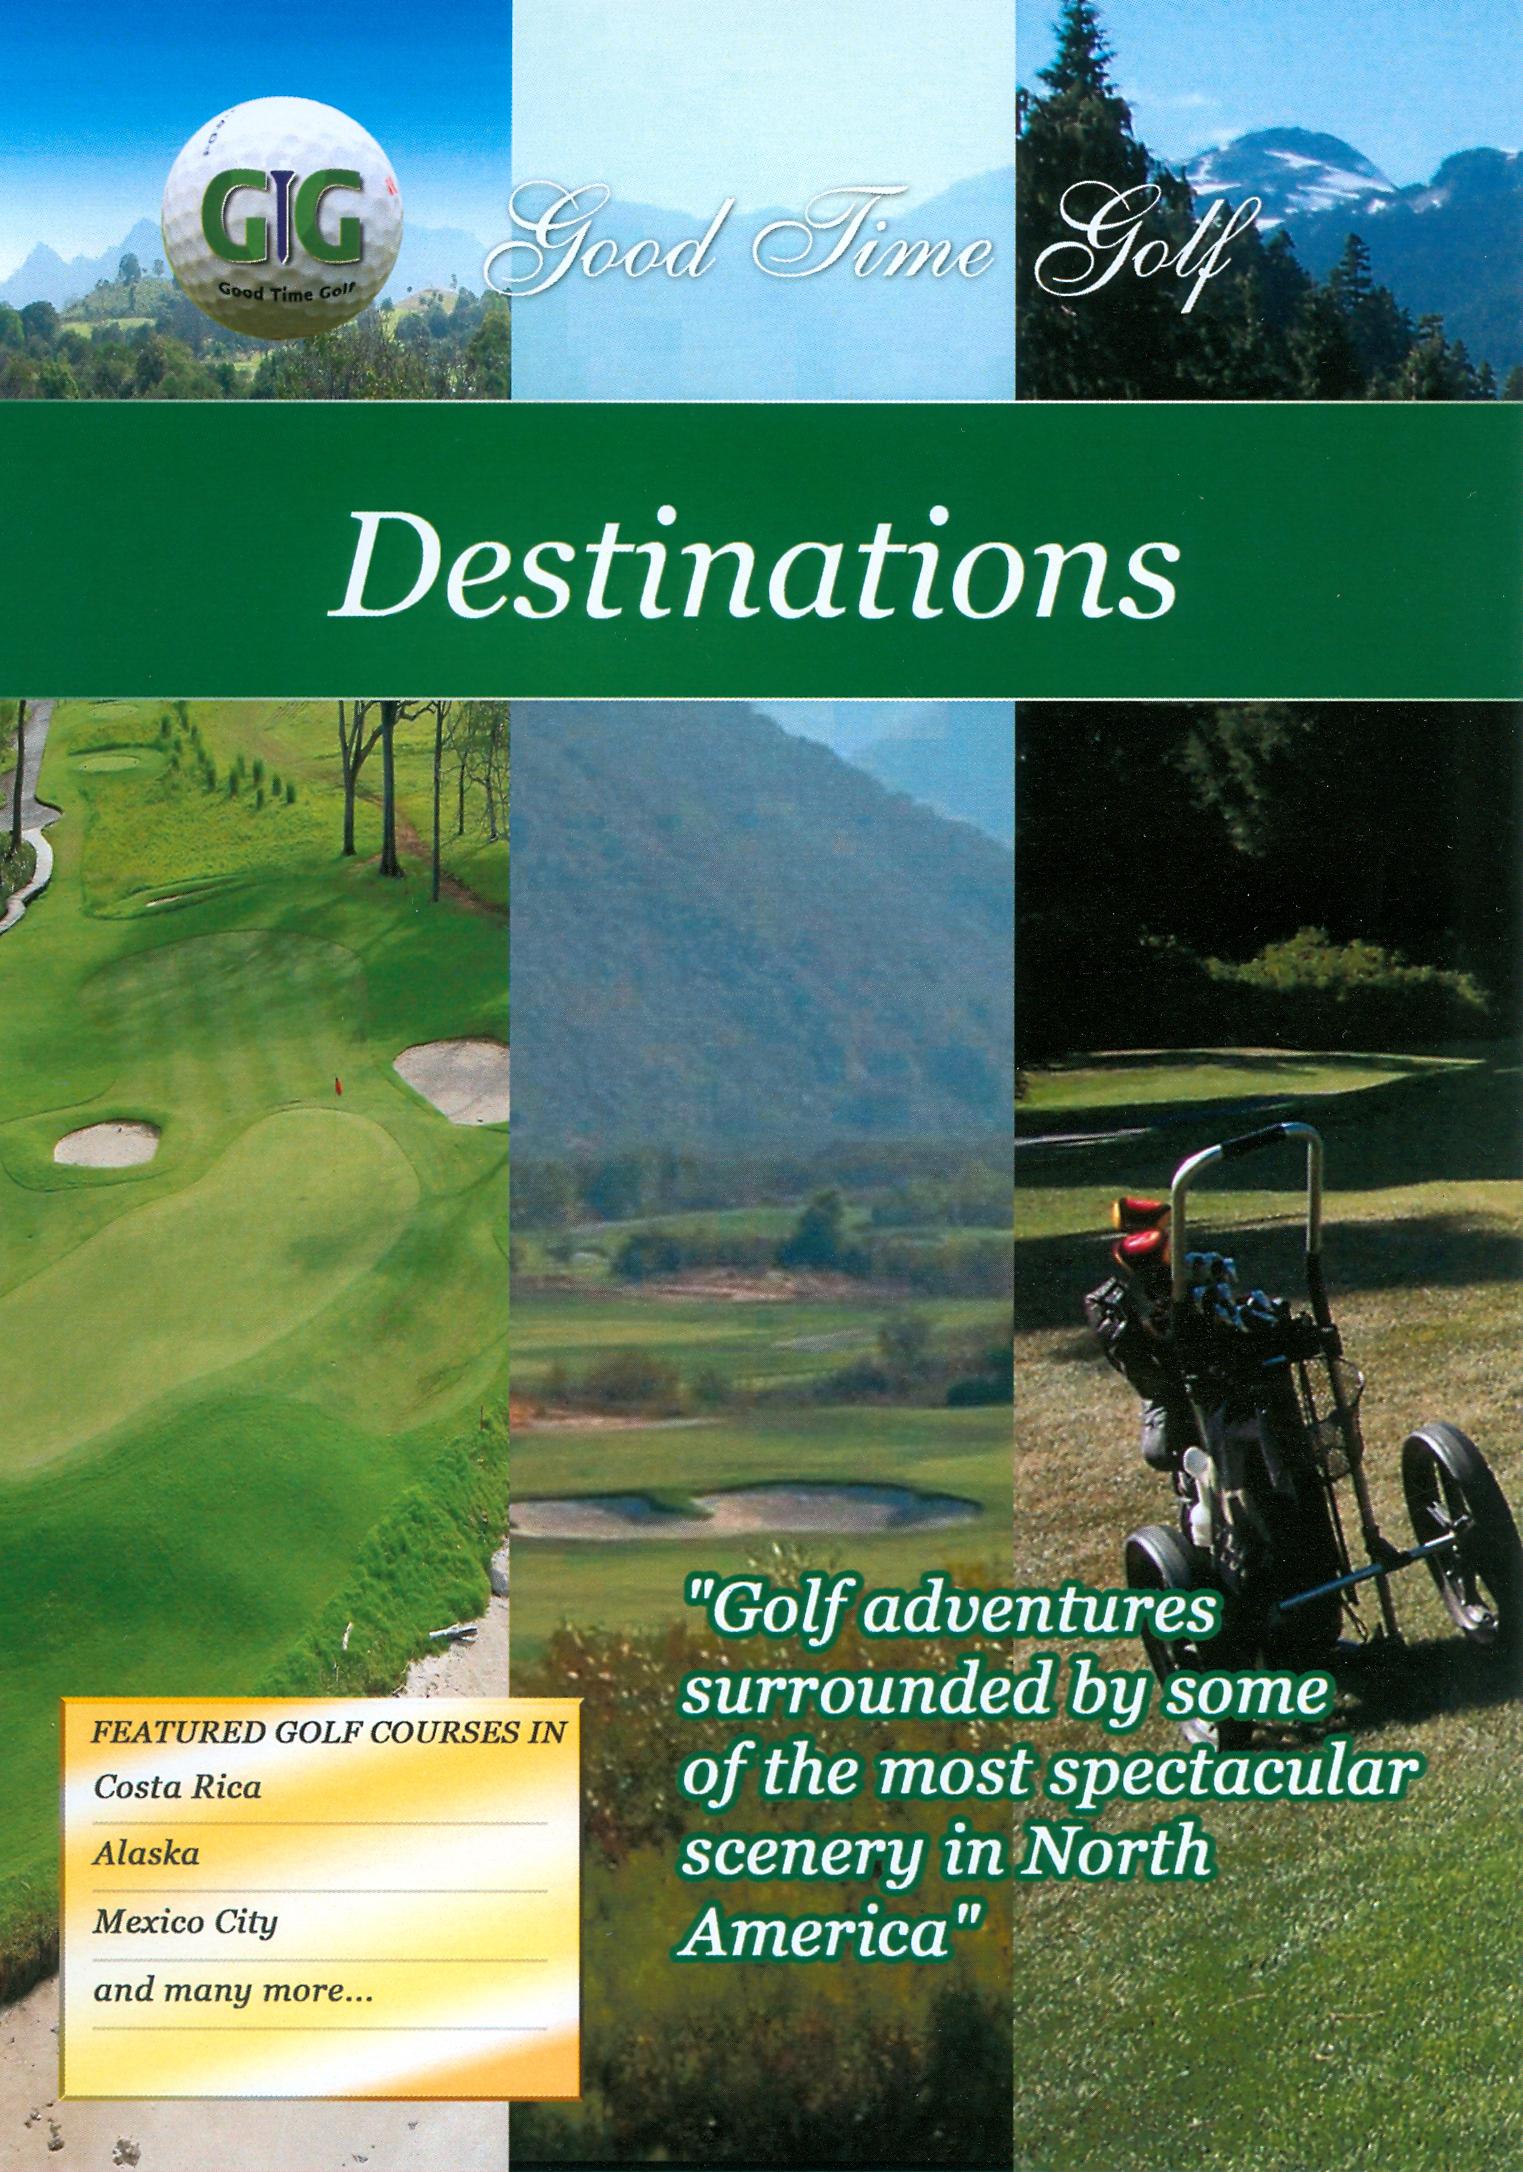 Good Time Golf: Destinations